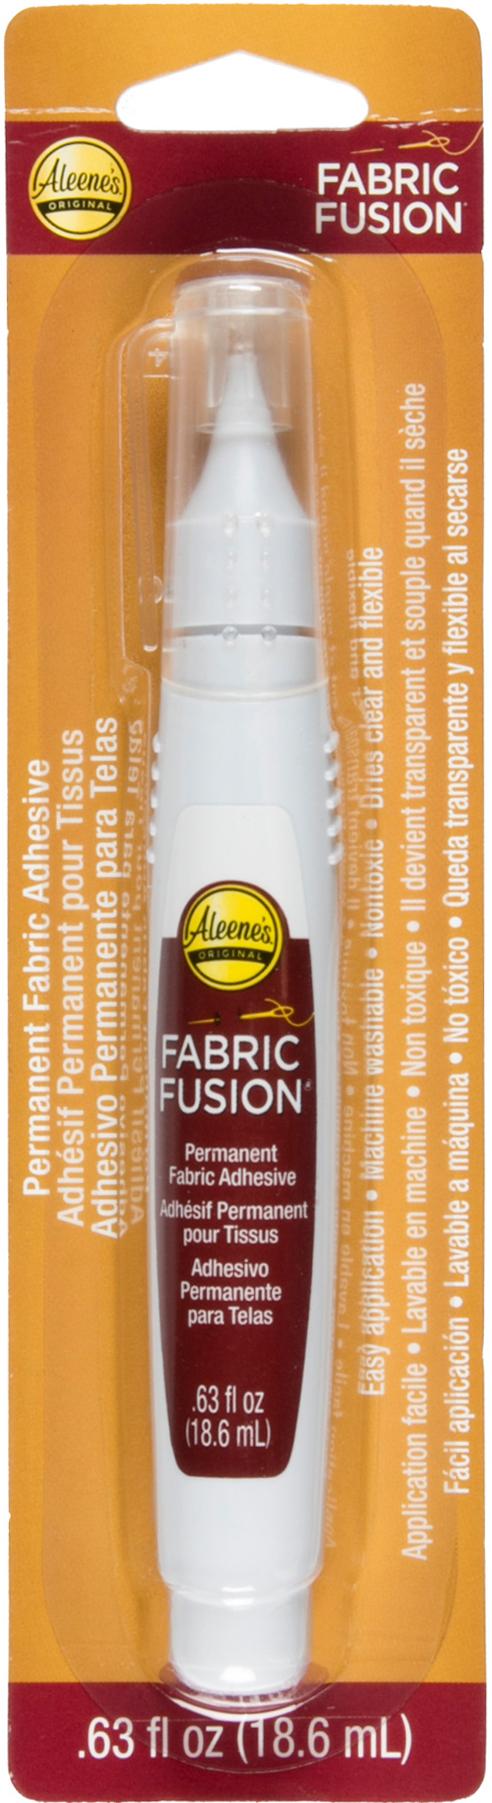 Aleene's Fabric Fusion Permanent Adhesive Pen-.63oz